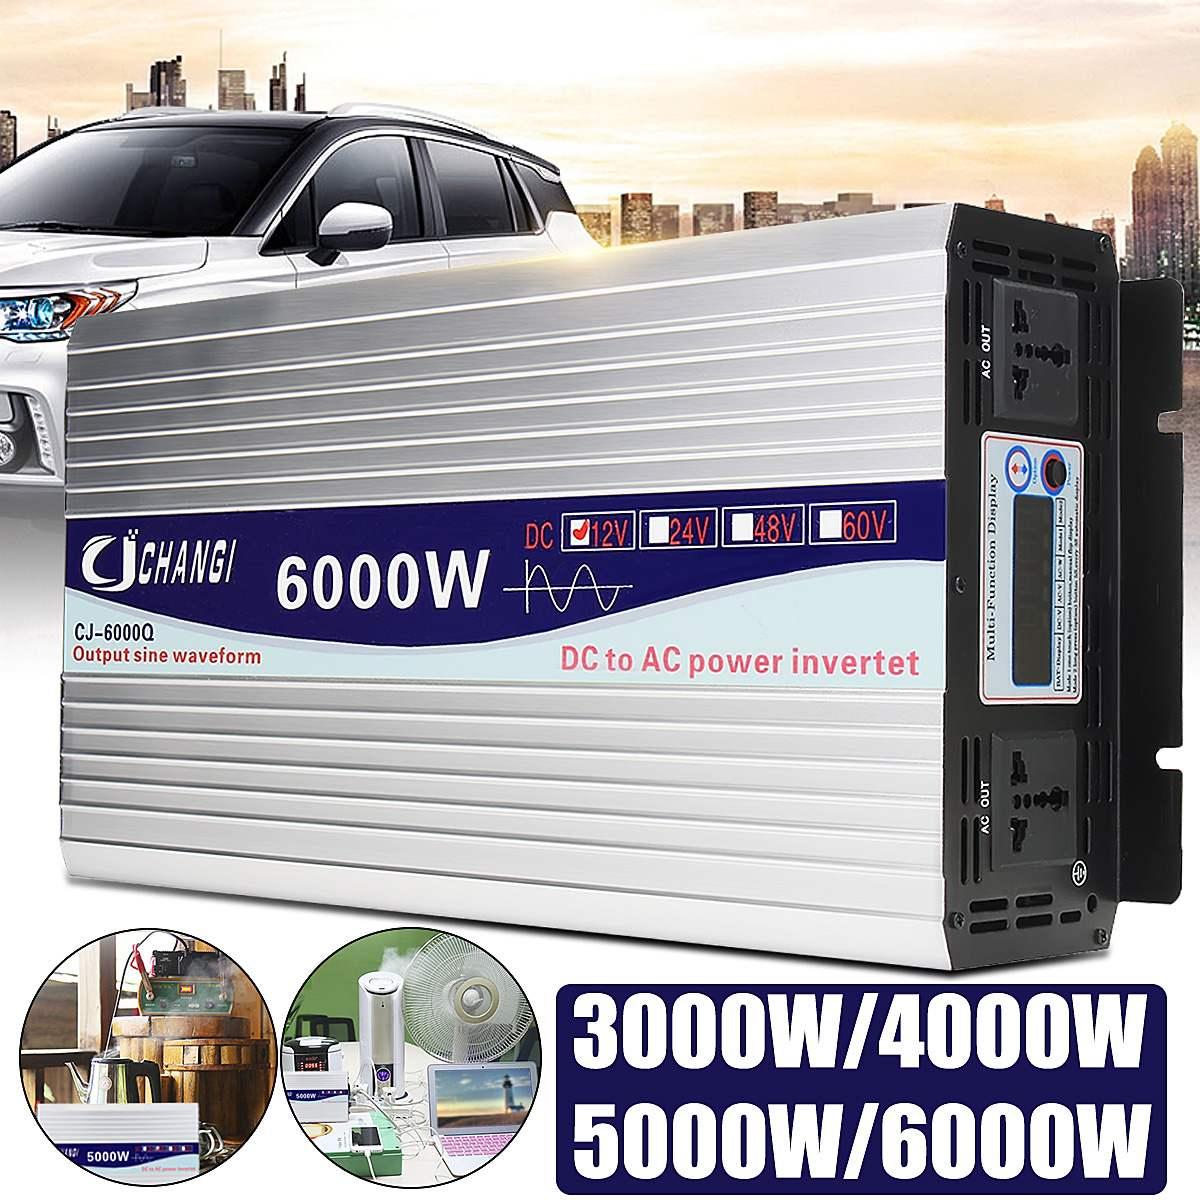 Sinusoïdale Pure Onduleur à Onde 12 v/24 v 110 v 6000 w/5000 w/4000 w/ 3000 w Convertisseur de Tension Transformateur 12 v/24 v 110 v Solaire Power Inverter